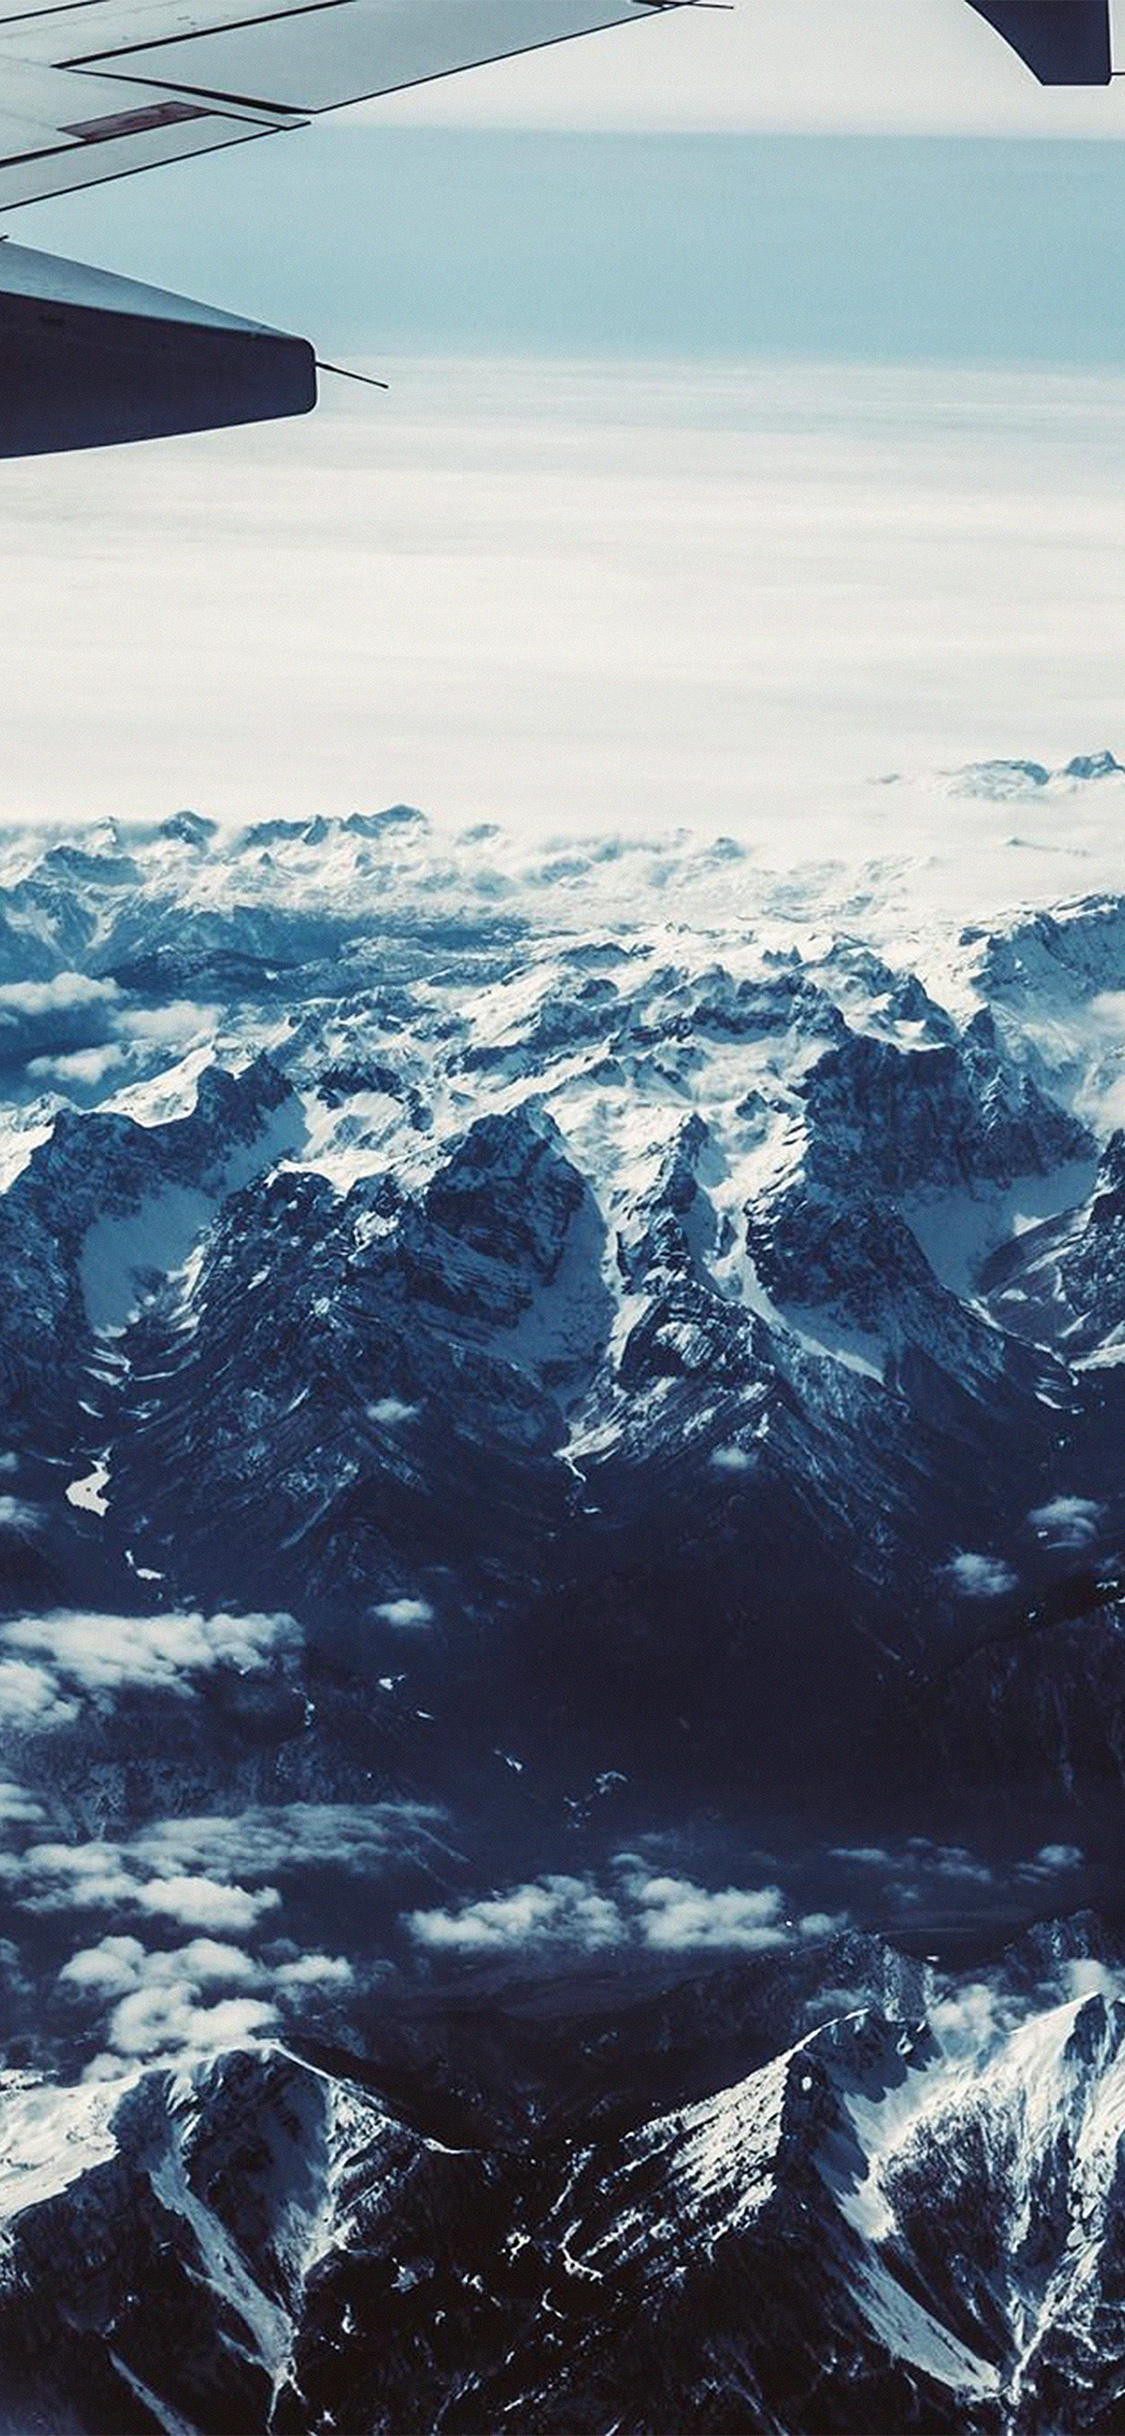 Nh43 Airplane Sky Mountain Snow Ice Nature Wallpaper